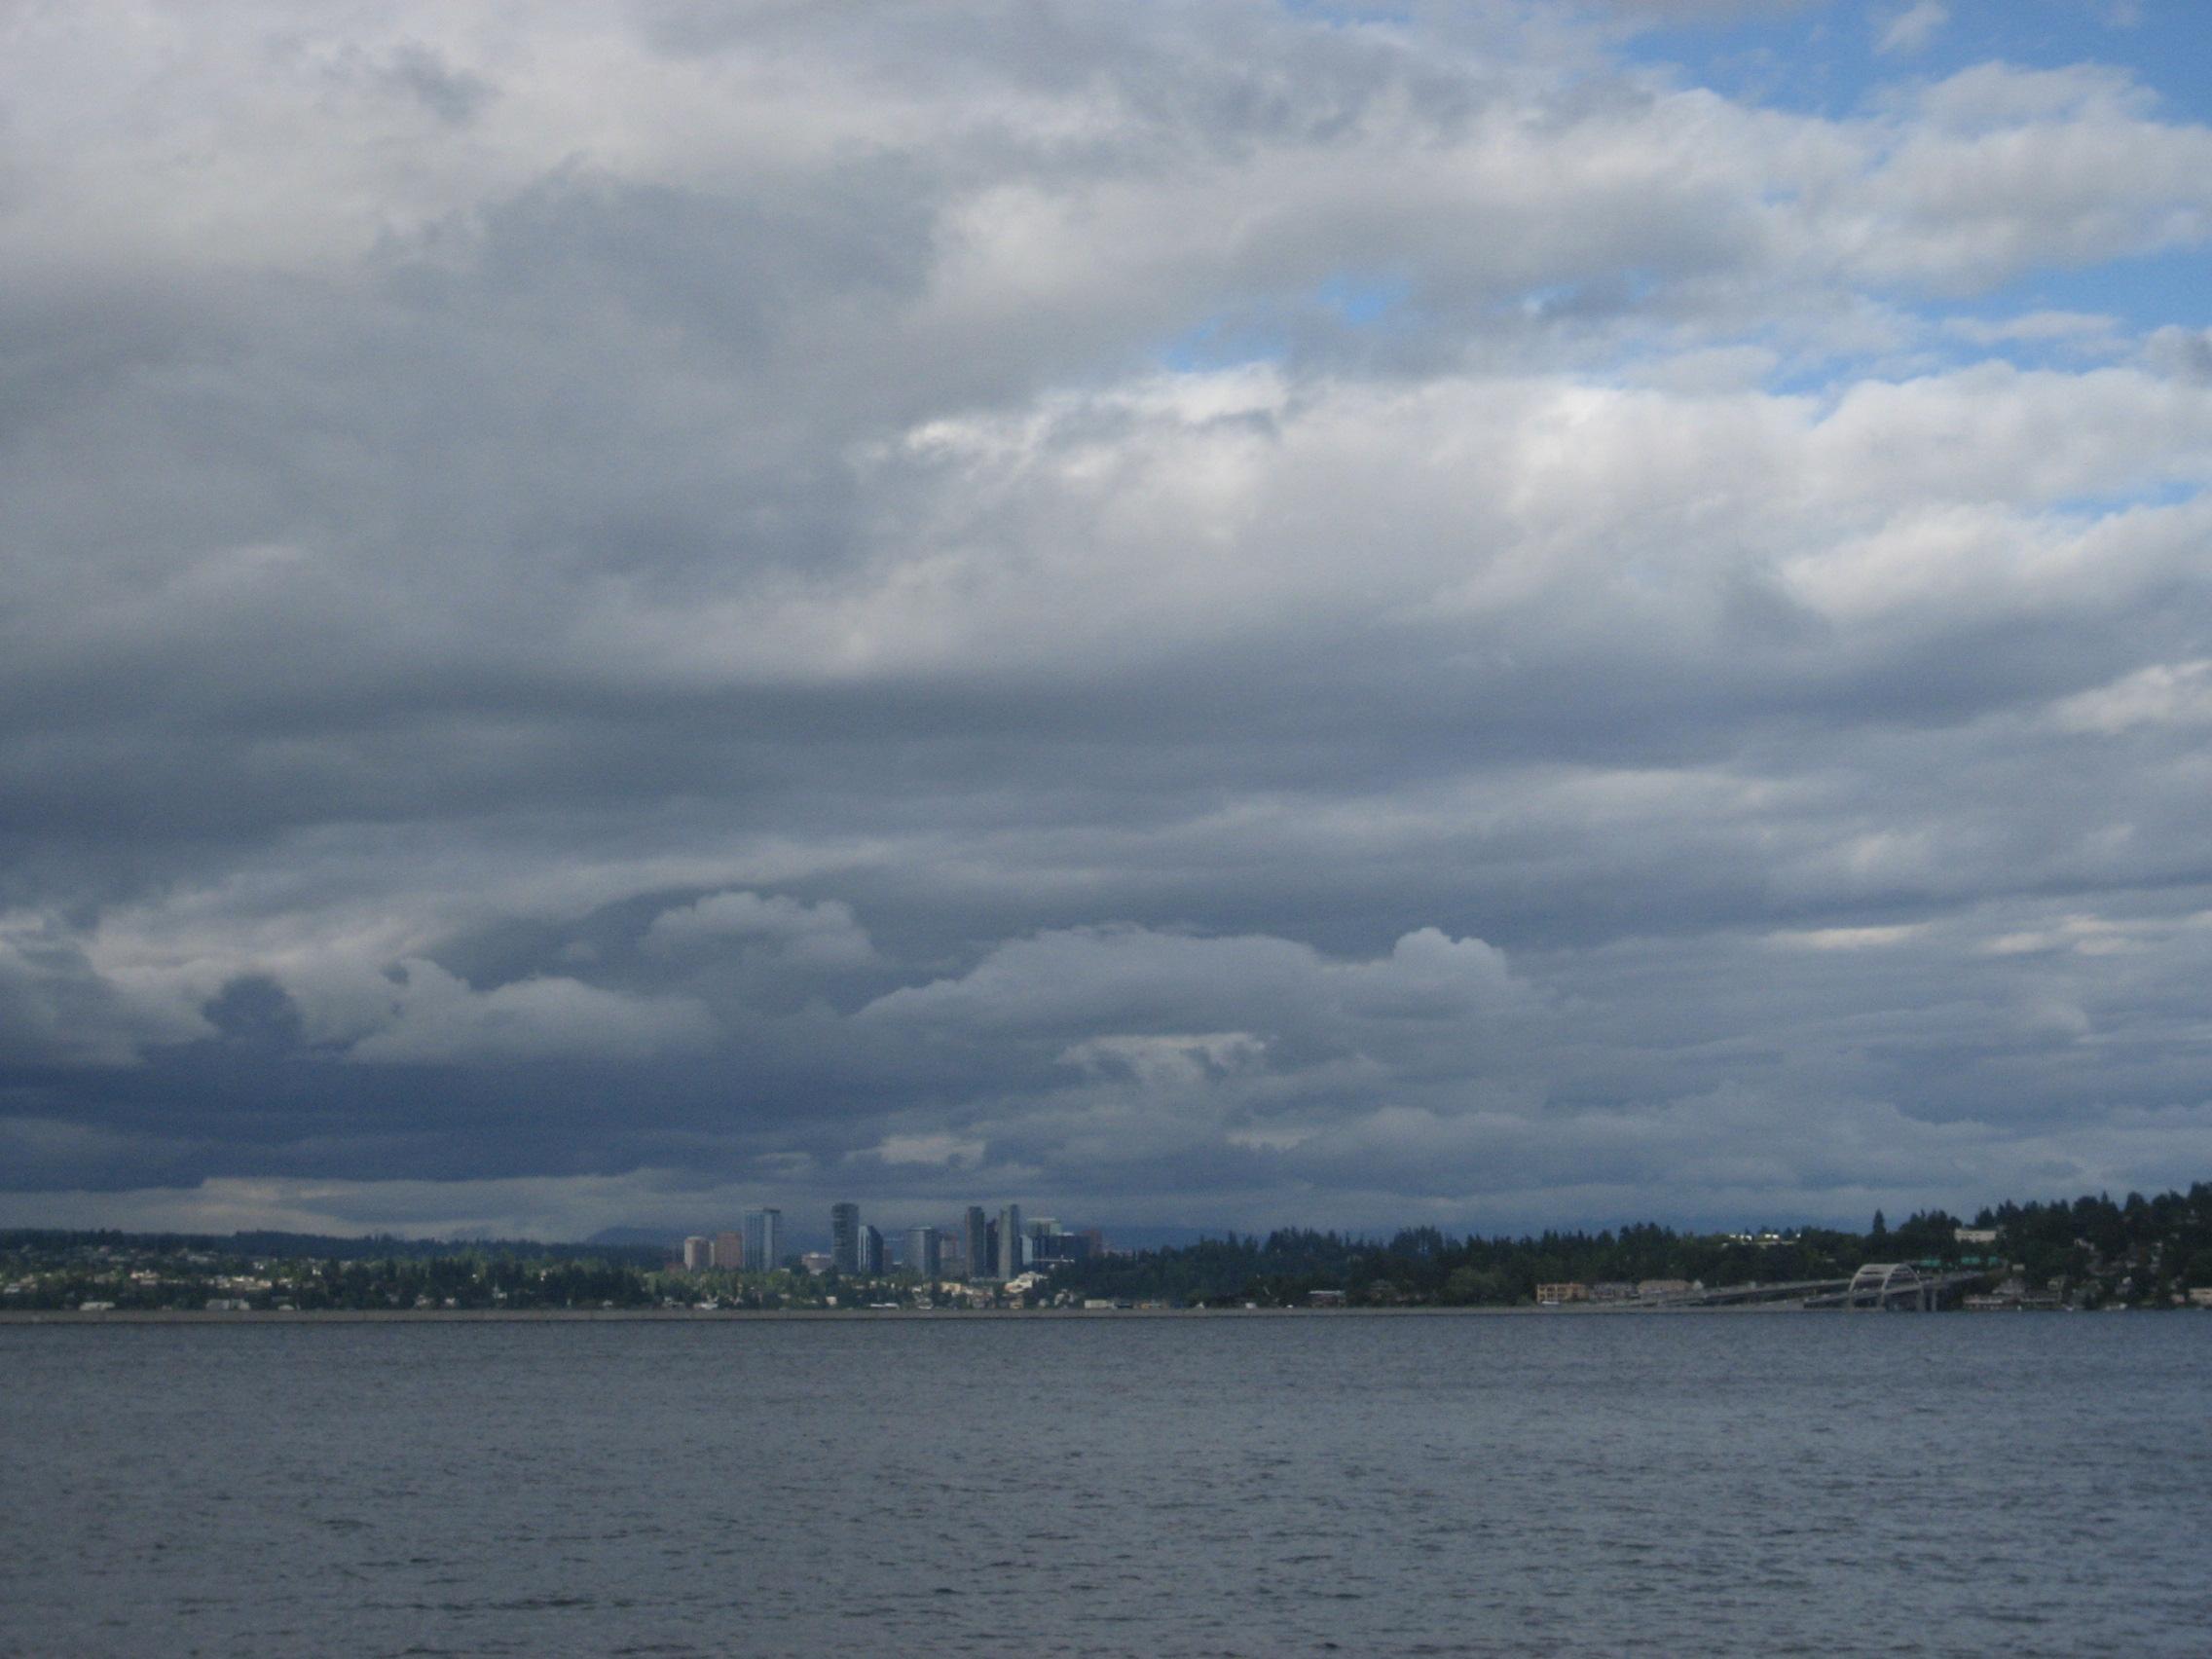 View from Lake Washington